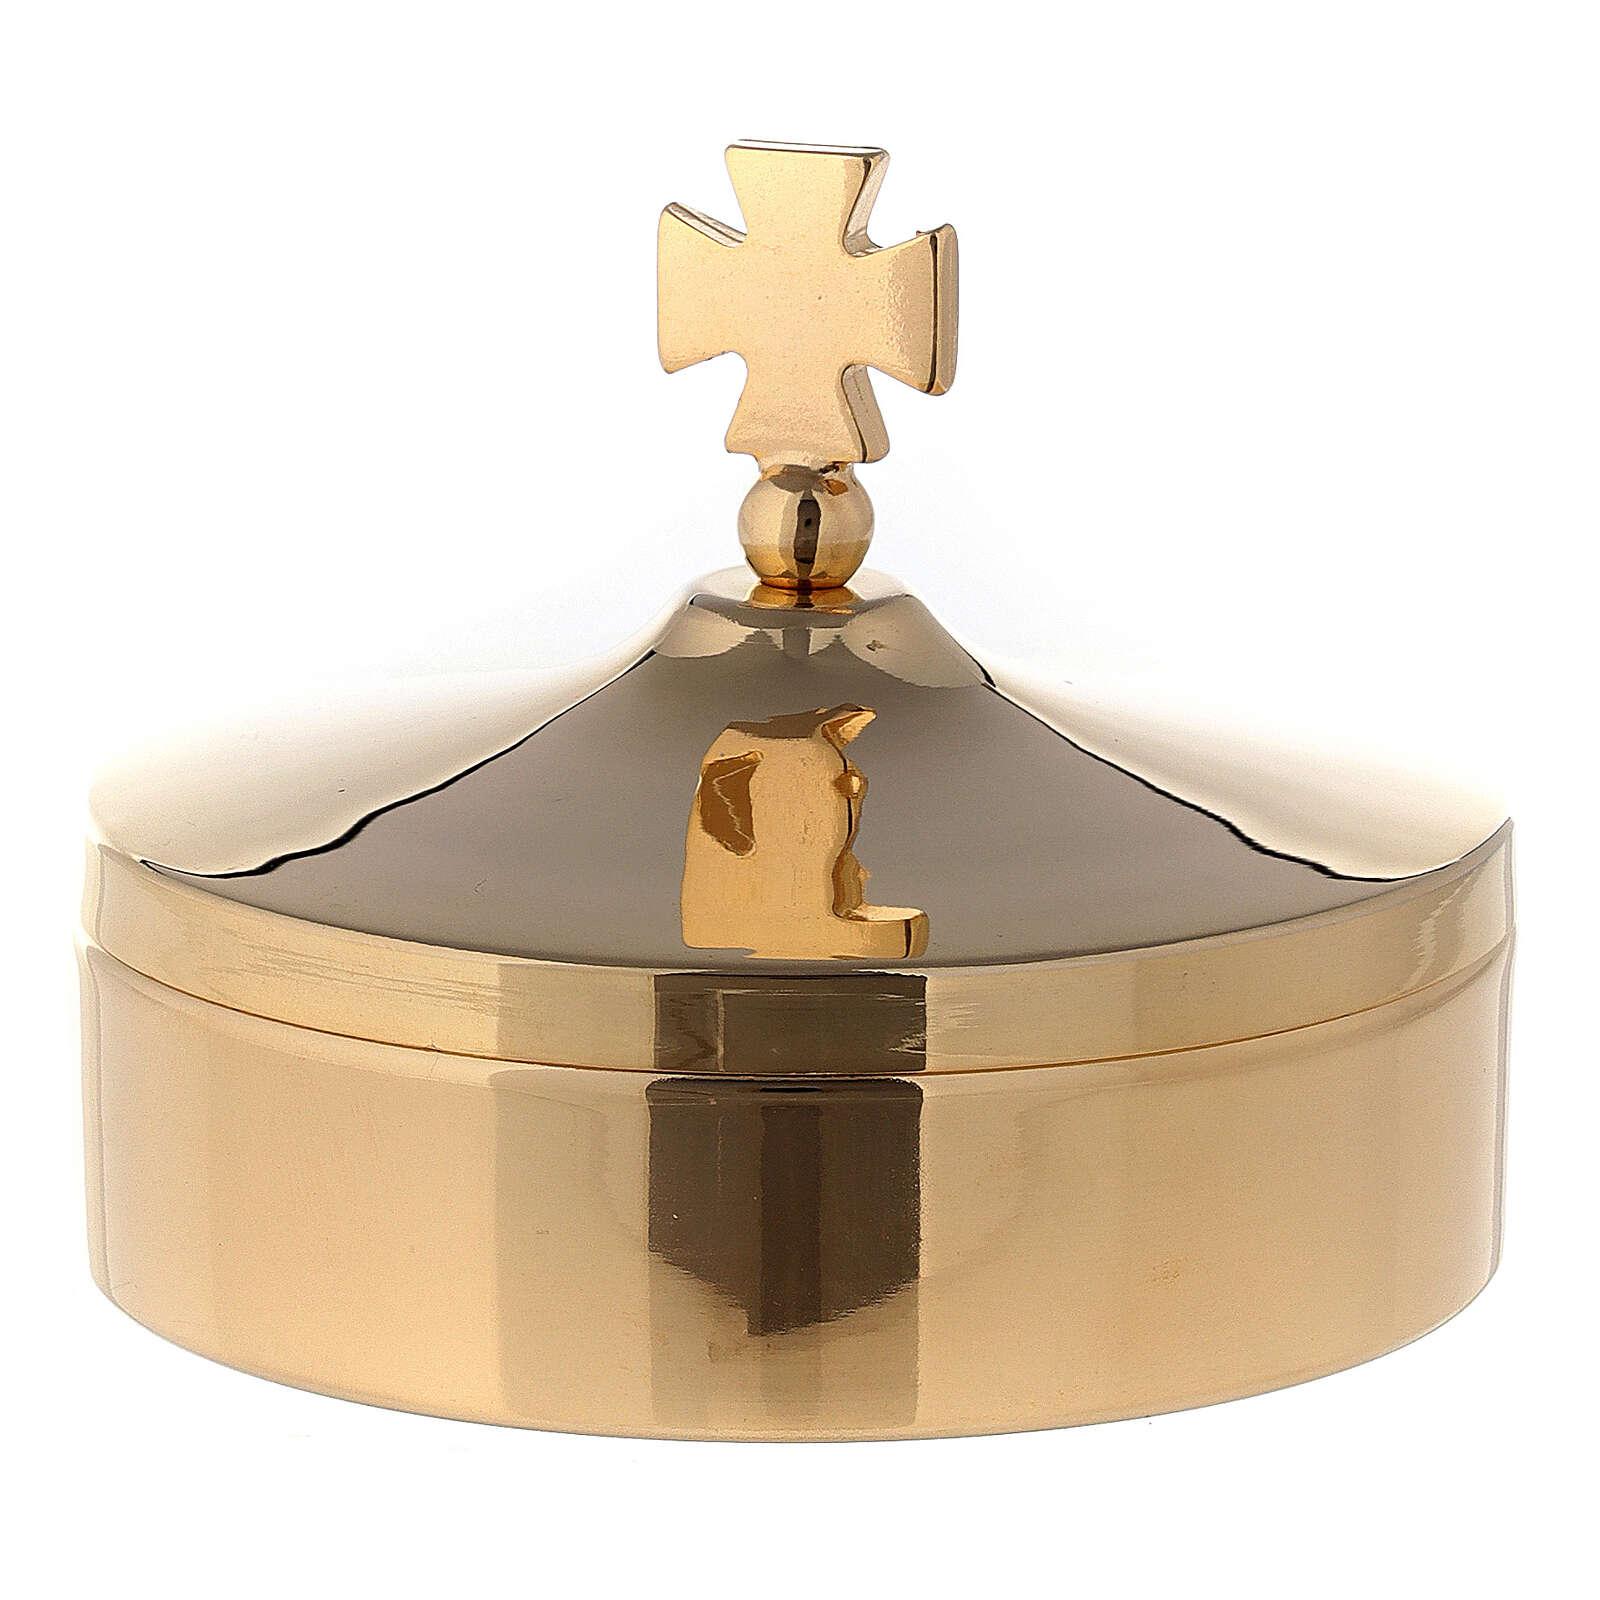 Catholic pyx diam 8 cm in 24k polished gold plated brass 3